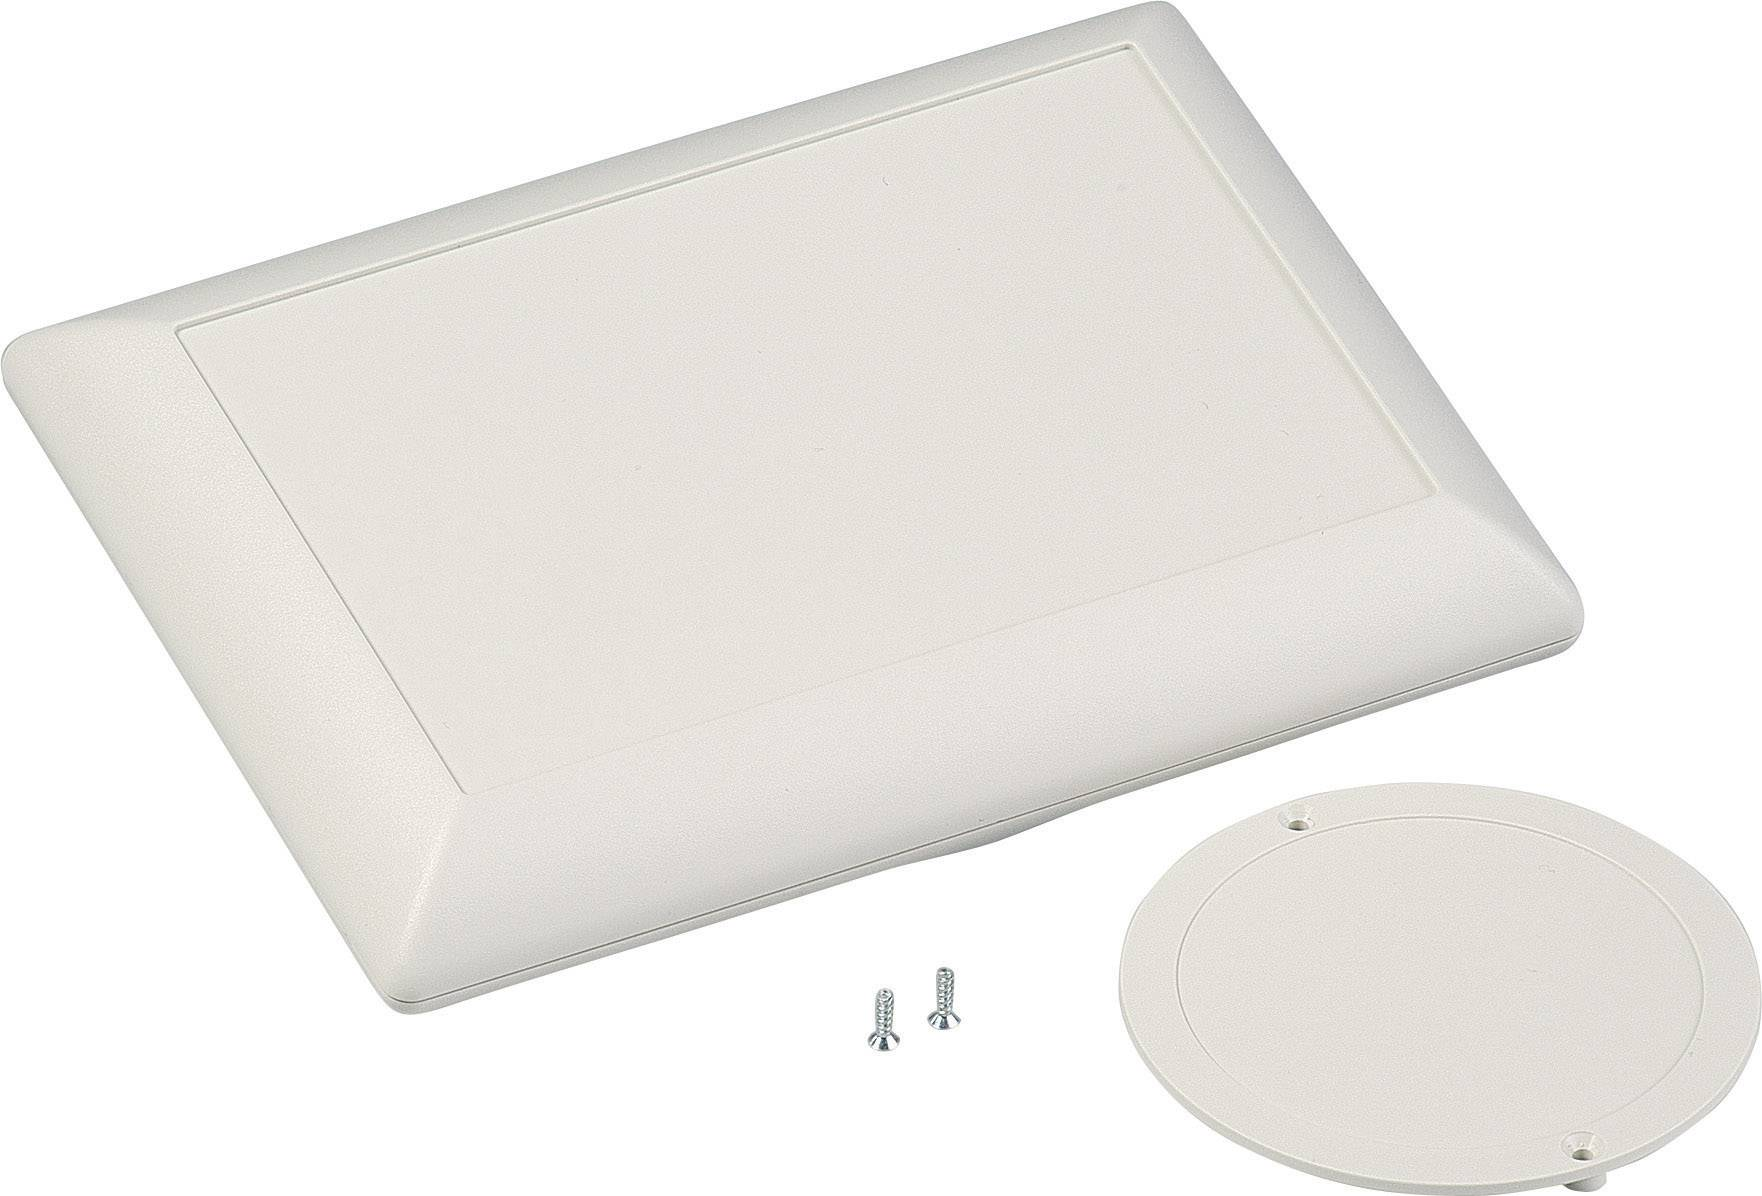 Pultové pouzdro ABS OKW D5017247, (d x š x v) 160 x 110 x 40 mm, šedá